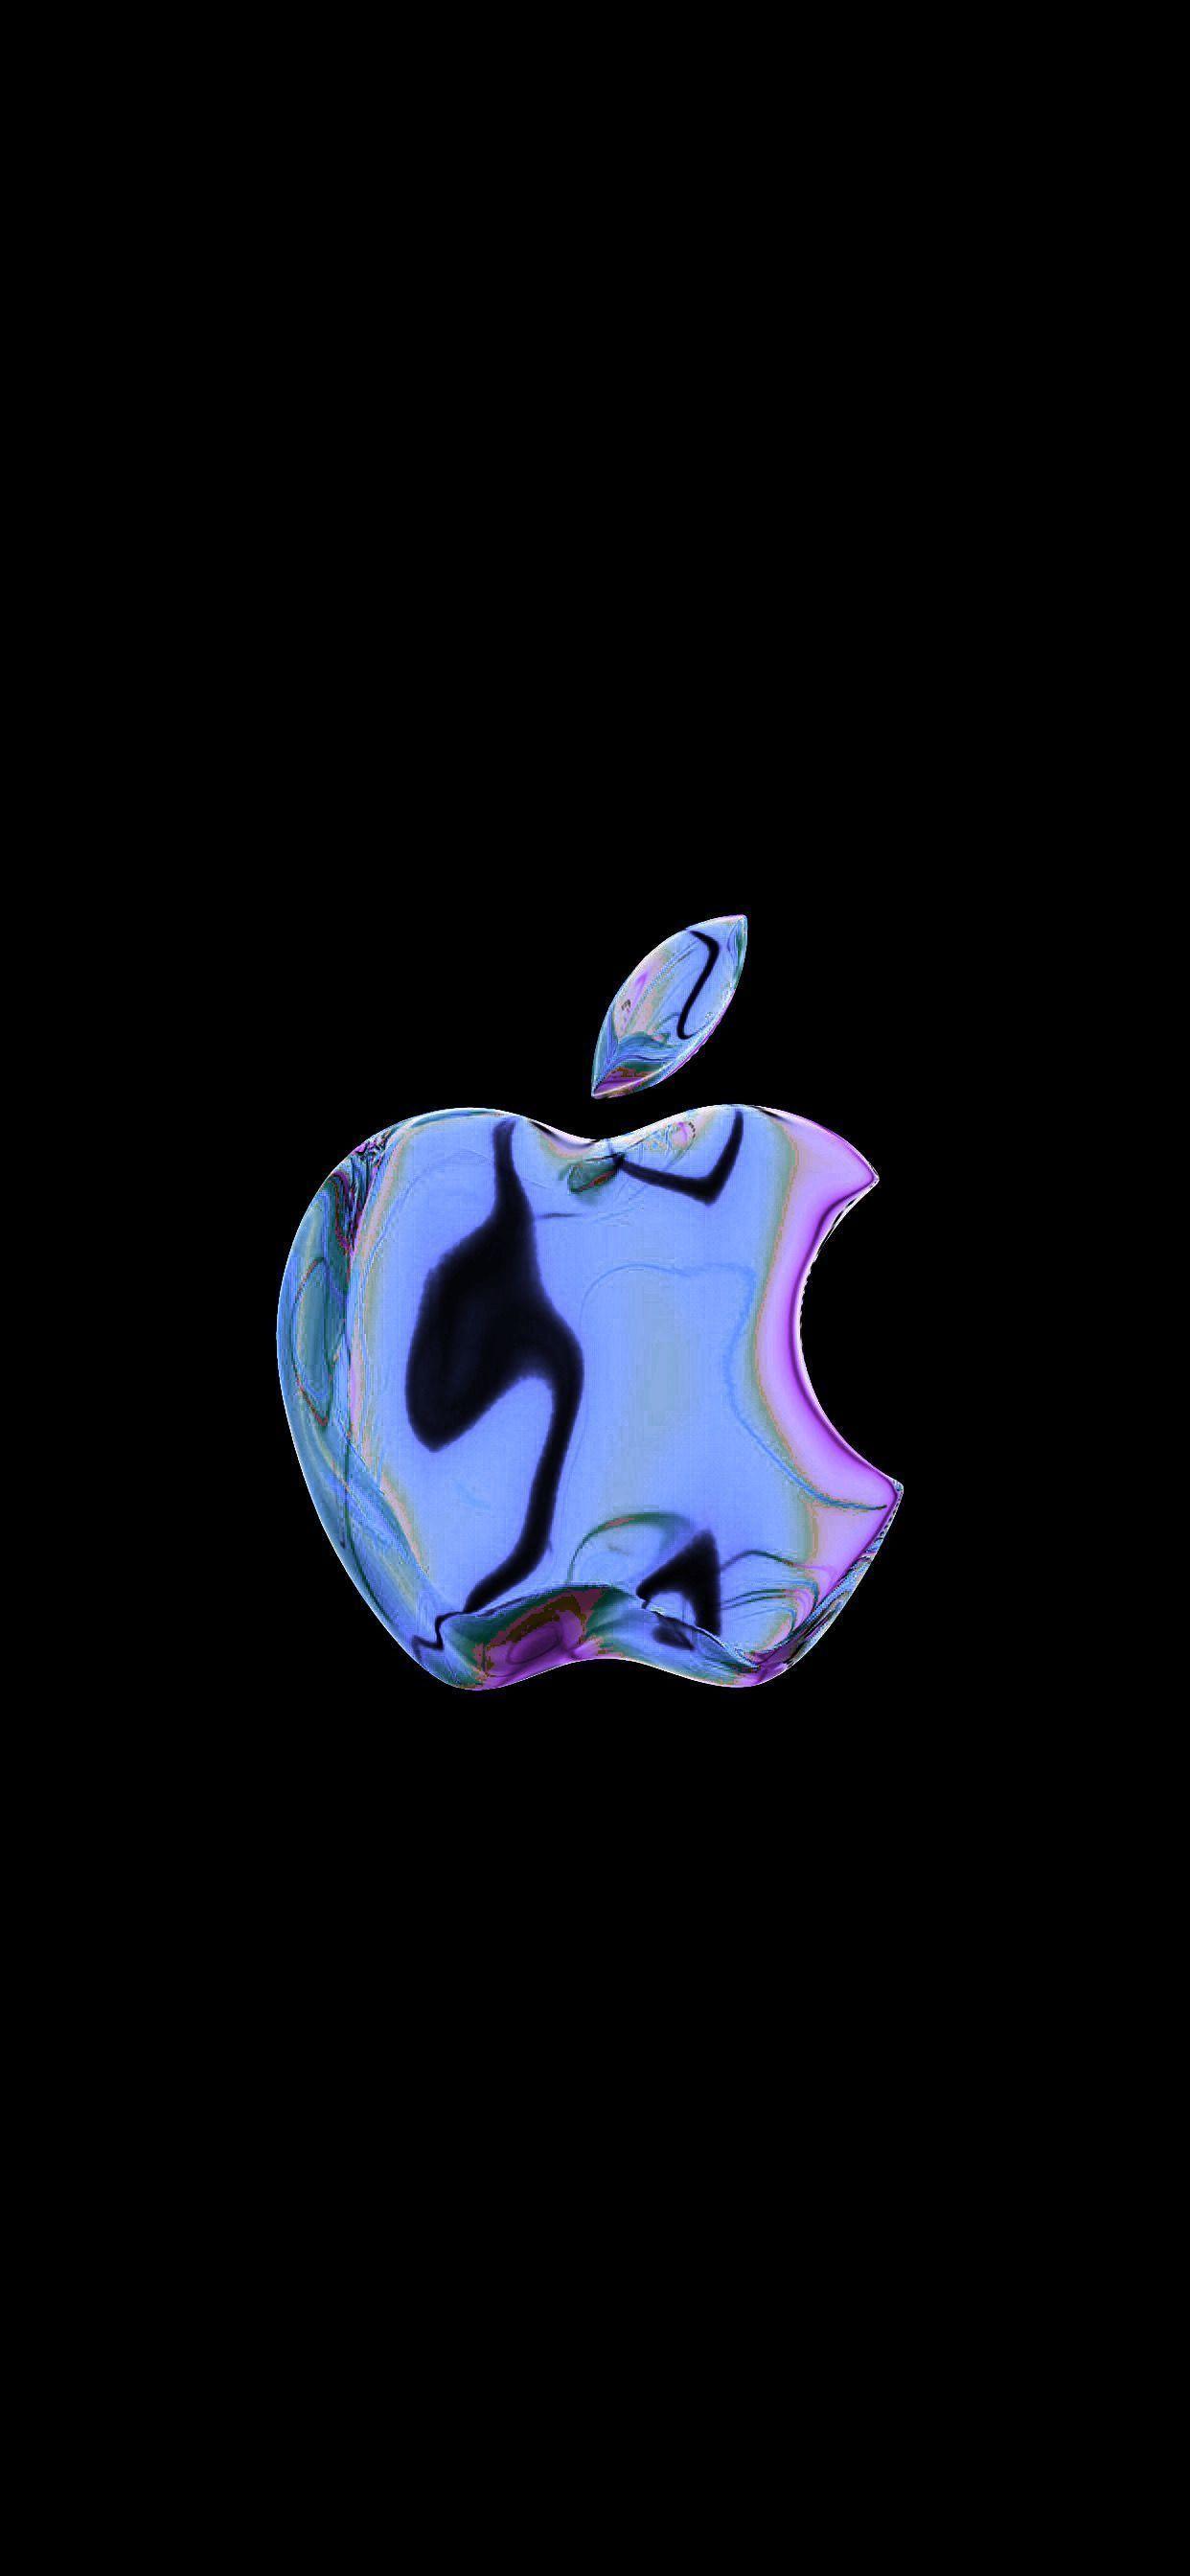 Ios 13 Wallpaper Iphone Dark Mode Ios 13 Wallpaper Iphone